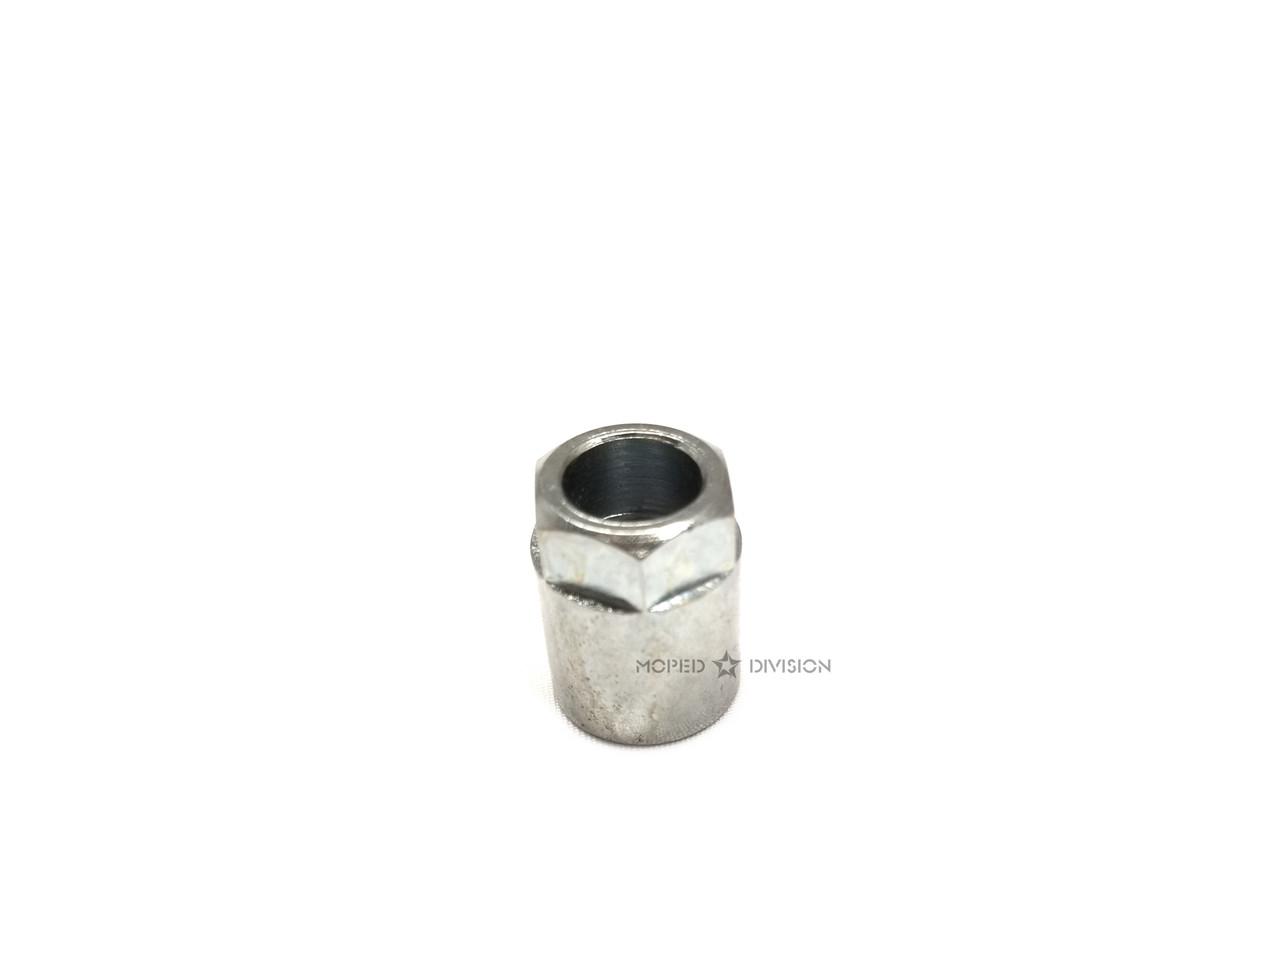 Motobecane Variator Nut, 11mm x 1 - Counter Clockwise thread